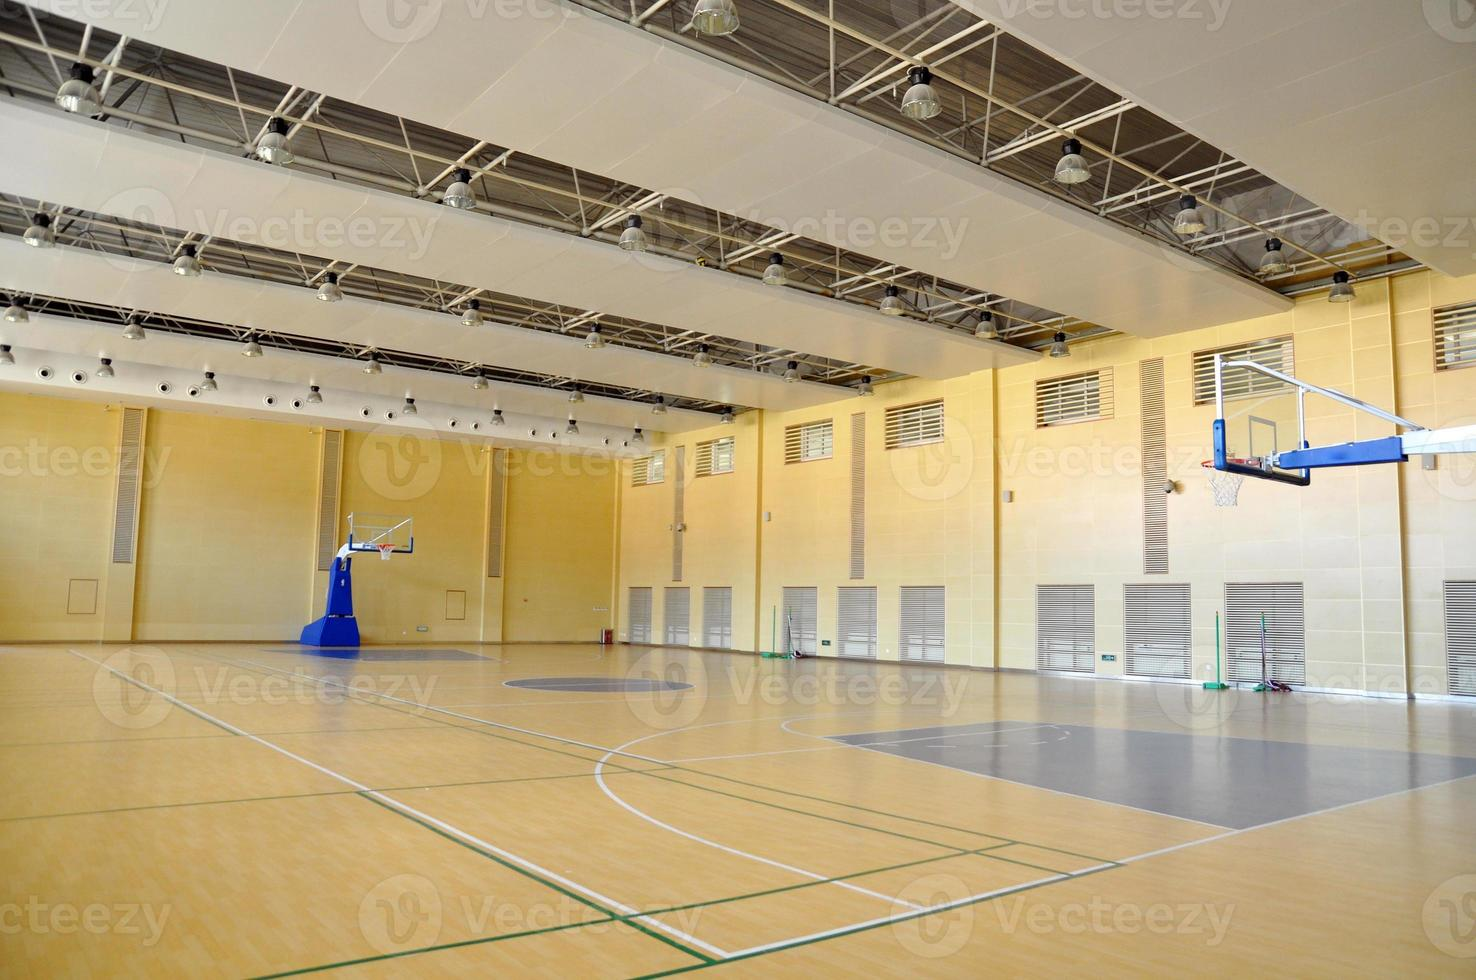 Indoor basketball court photo